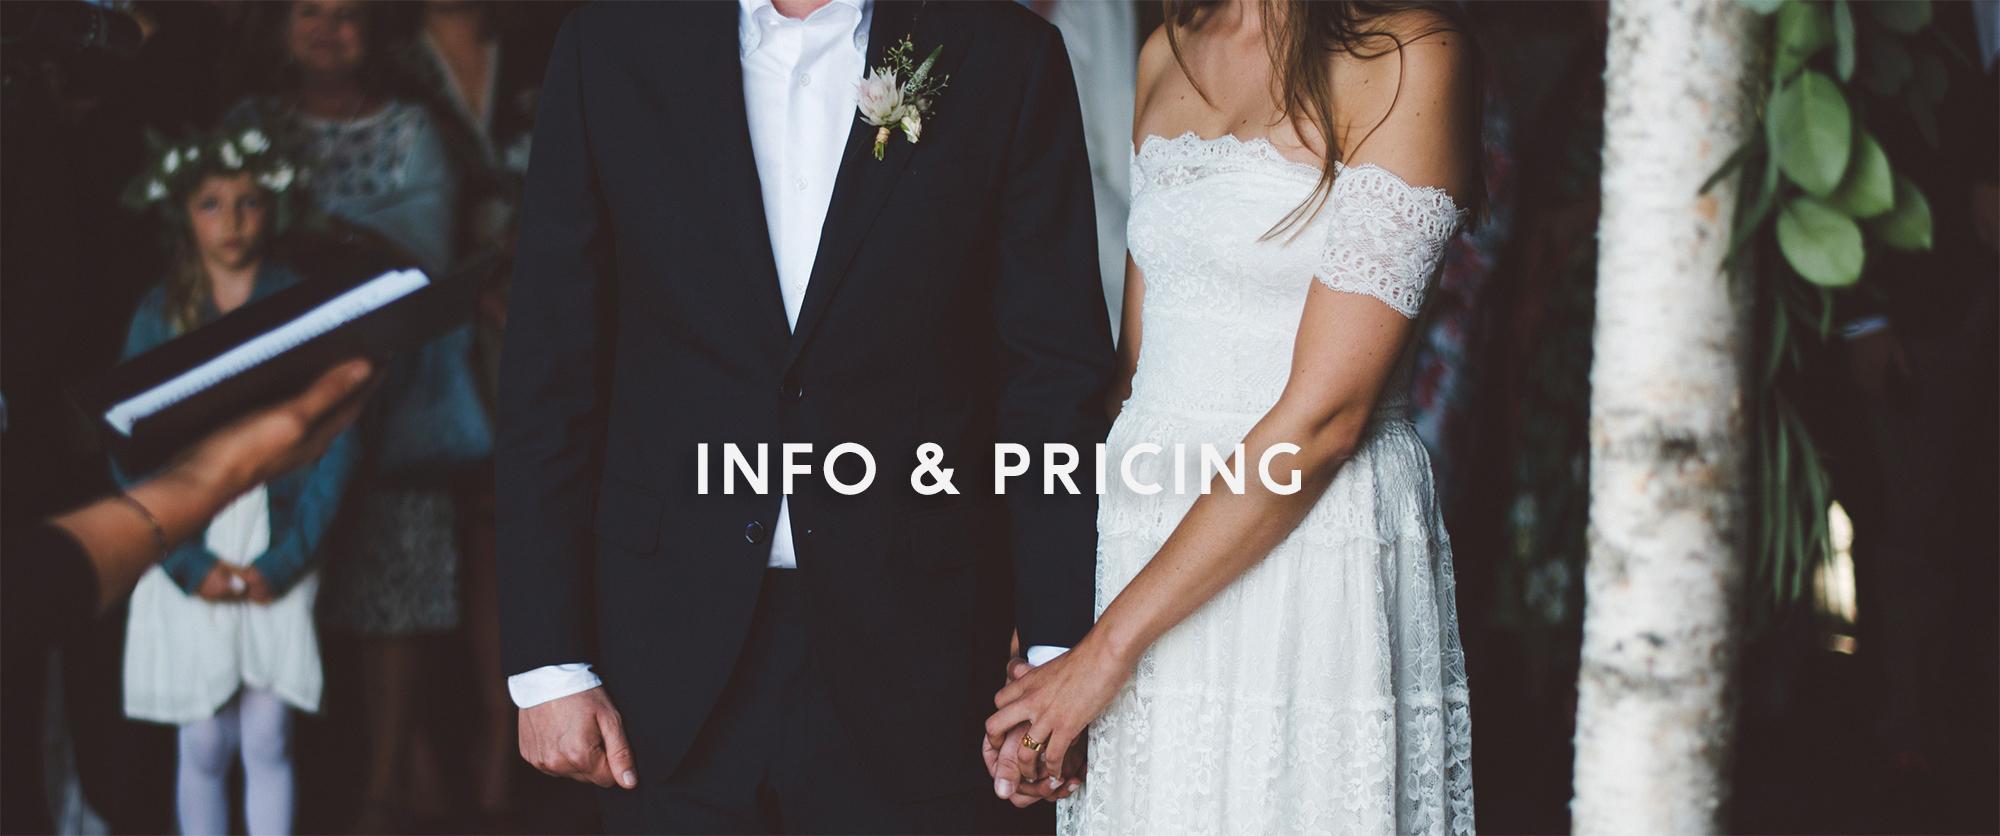 Johanna_Rosenlew_Documentary_wedding_Photography